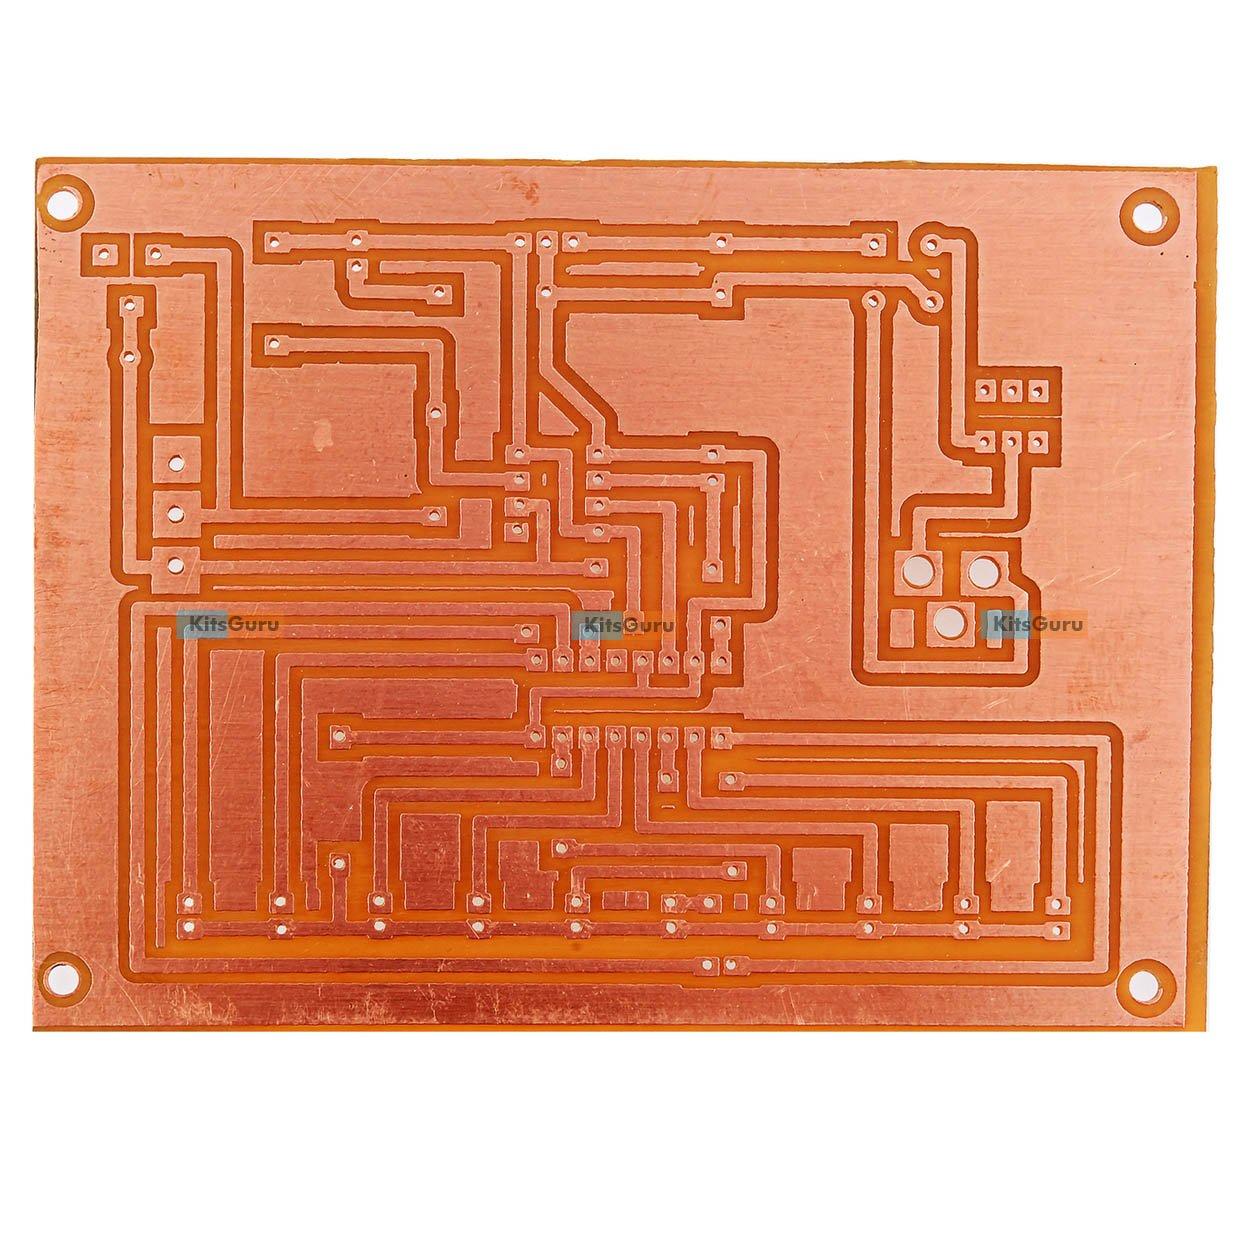 Kitsguru Diy Kit Led Chaser Circuit Lgkt078 Projects Amazon Home 555